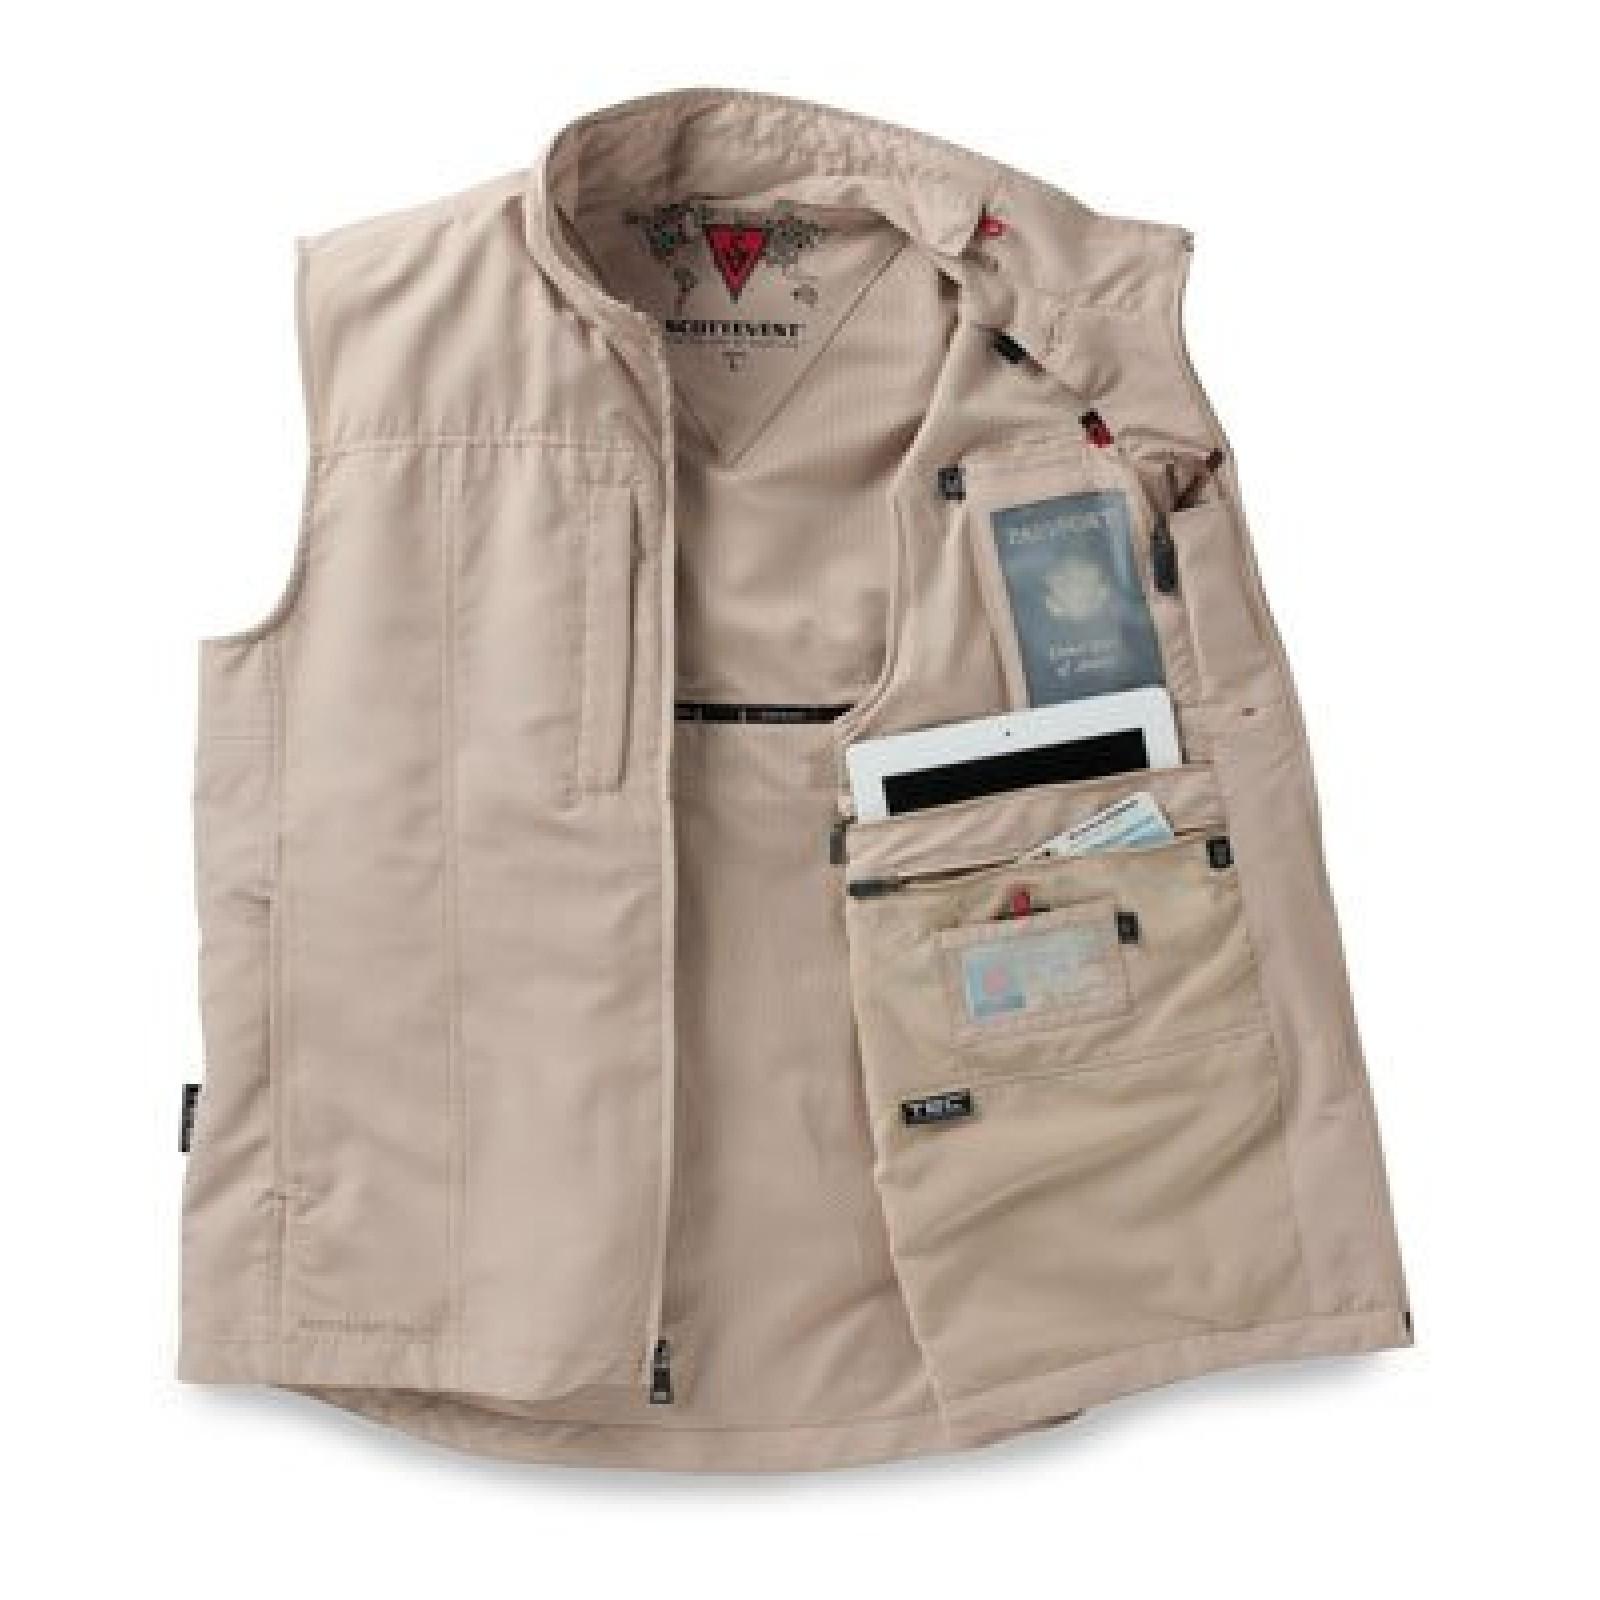 Scottevest Travel Vest Lookup Beforebuying